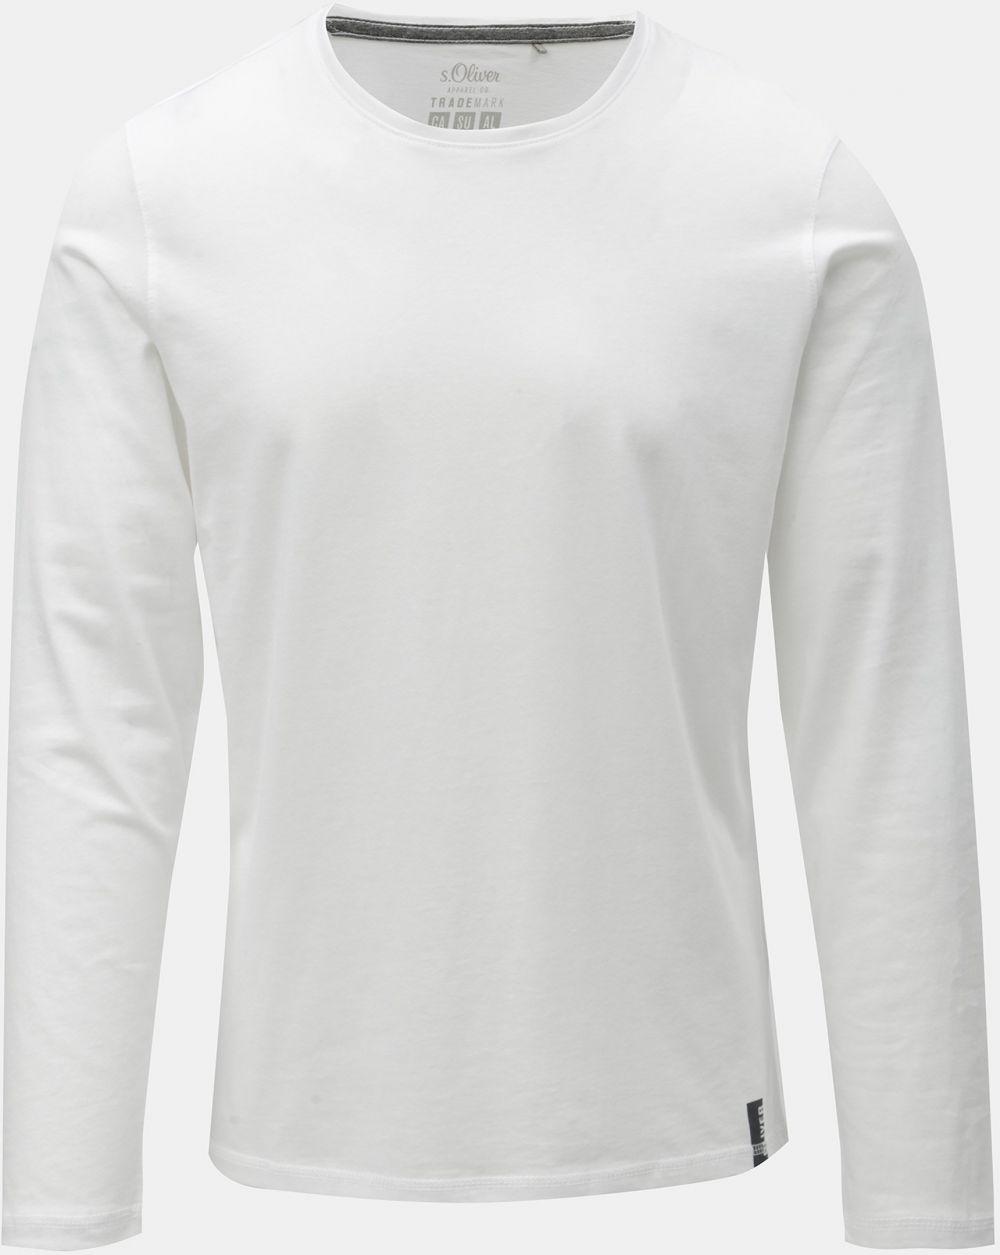 00ca16c4631d Biele pánske slim fit tričko s dlhým rukávom s.Oliver značky s.Oliver -  Lovely.sk